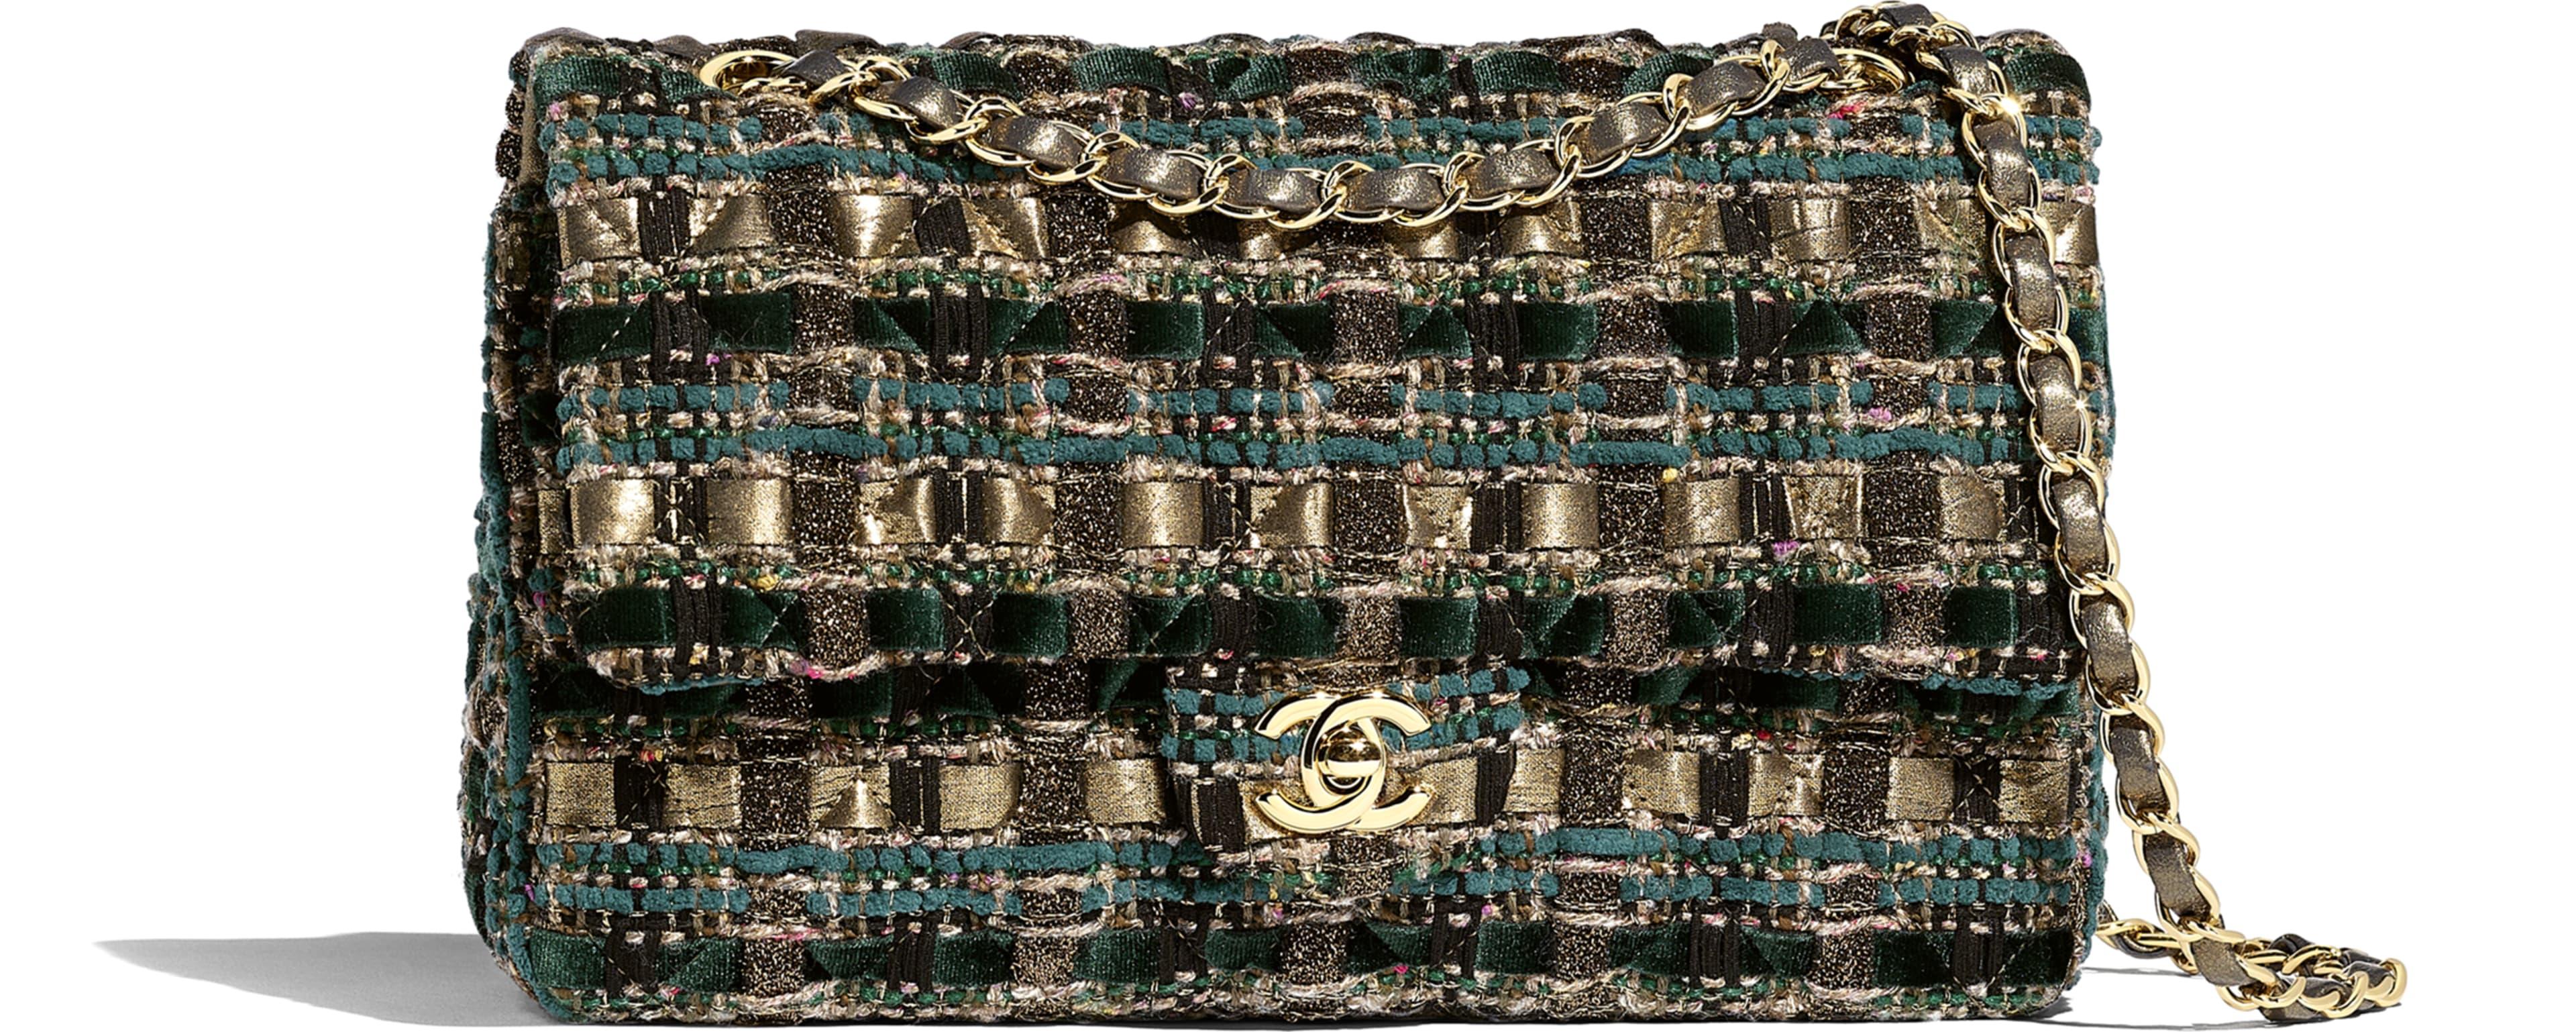 Tweed & Gold-Tone Metal Green, Gold, Beige & Black